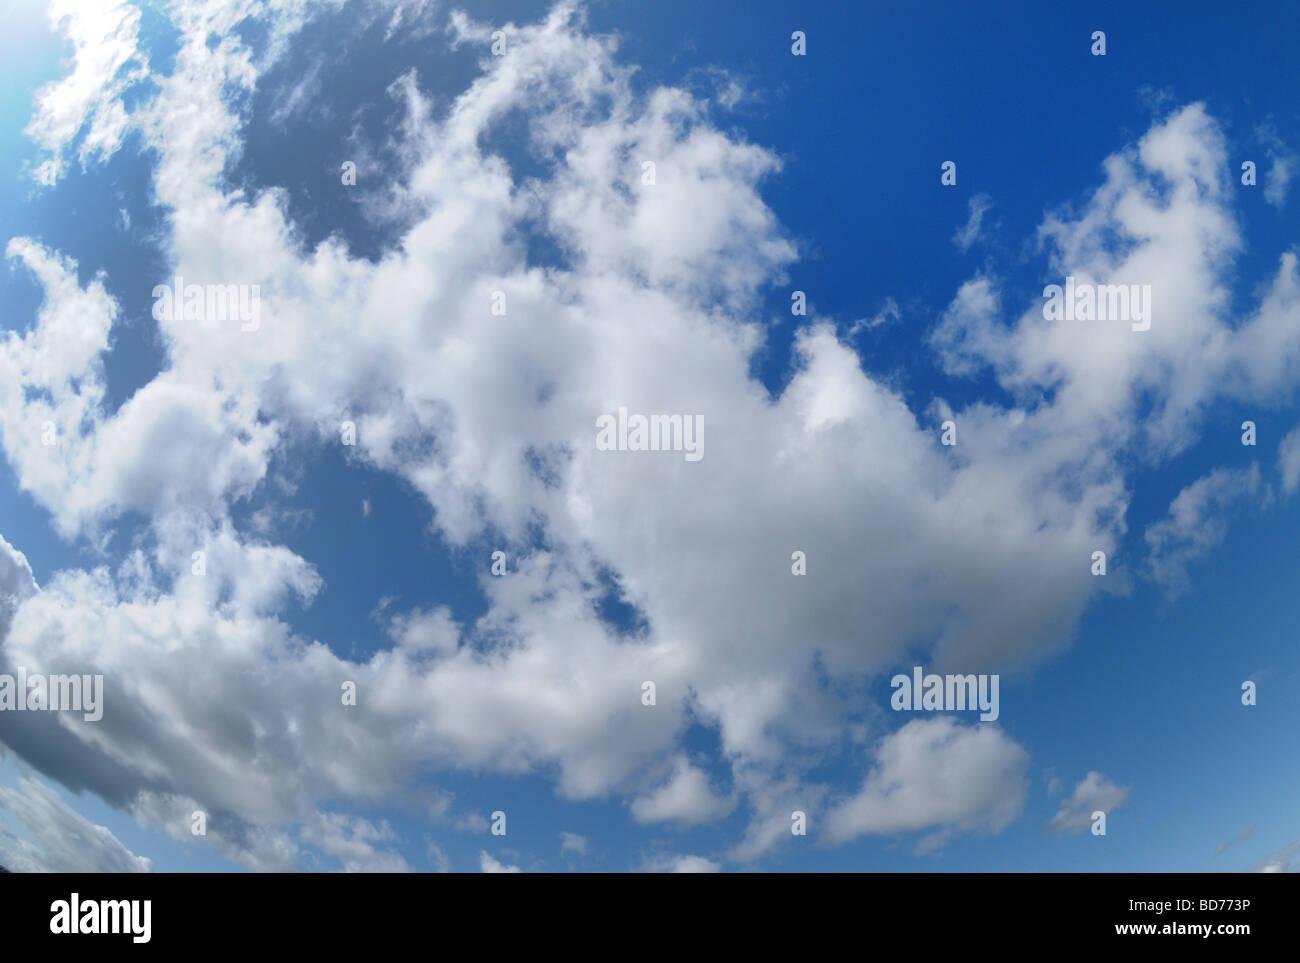 Cumulus cloud e il blu del cielo. Immagini Stock